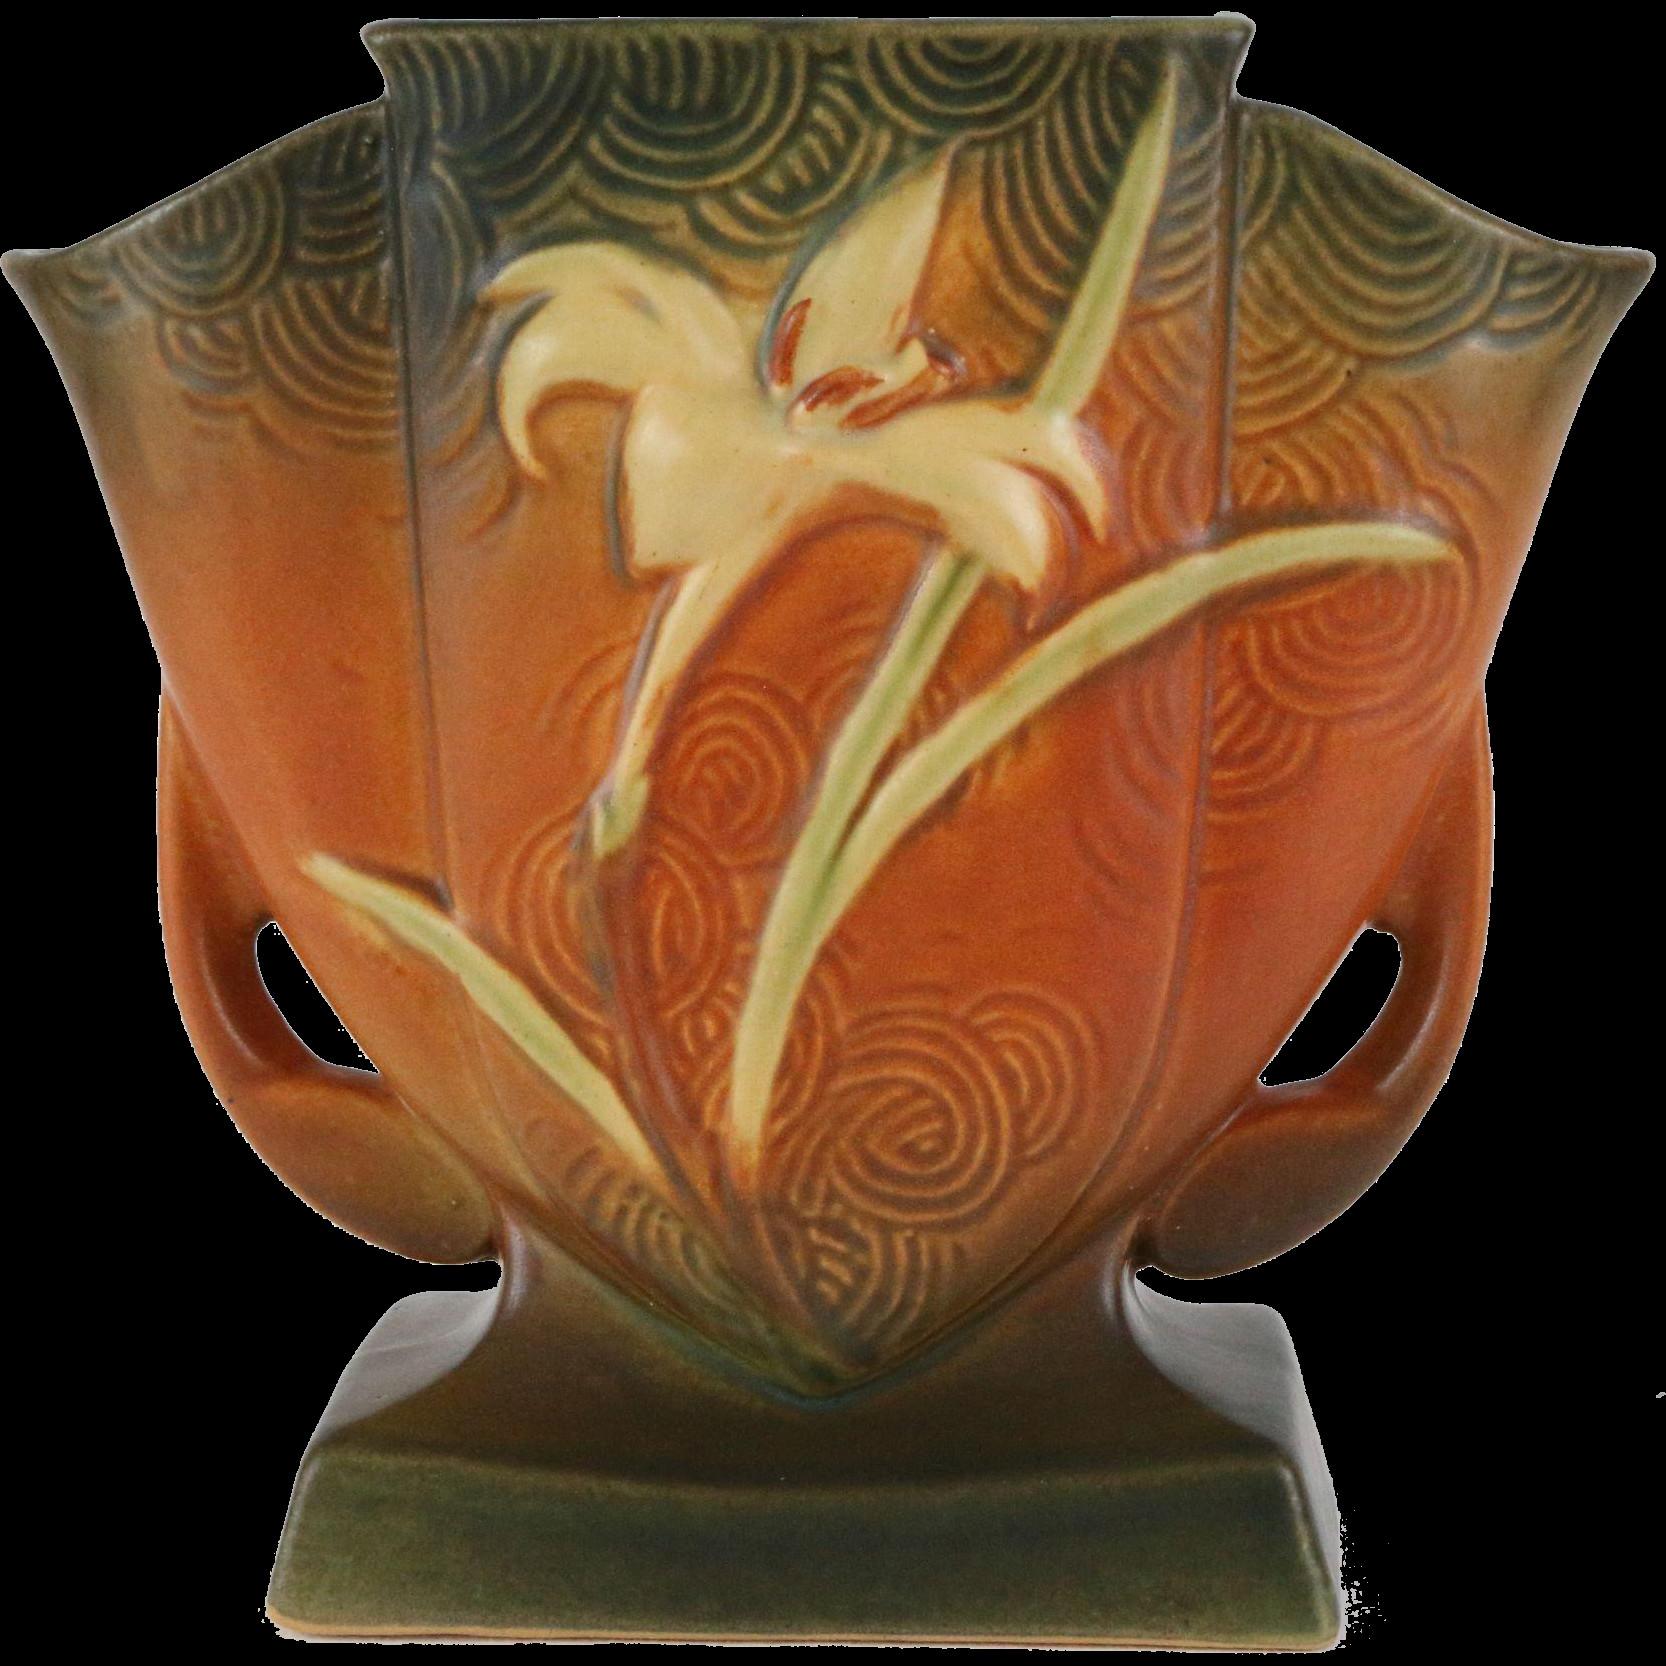 mccoy pottery green vase of roseville zephyr lily 7 fan vase 206 7 roseville decorative regarding roseville zephyr lily 7 fan vase 206 7